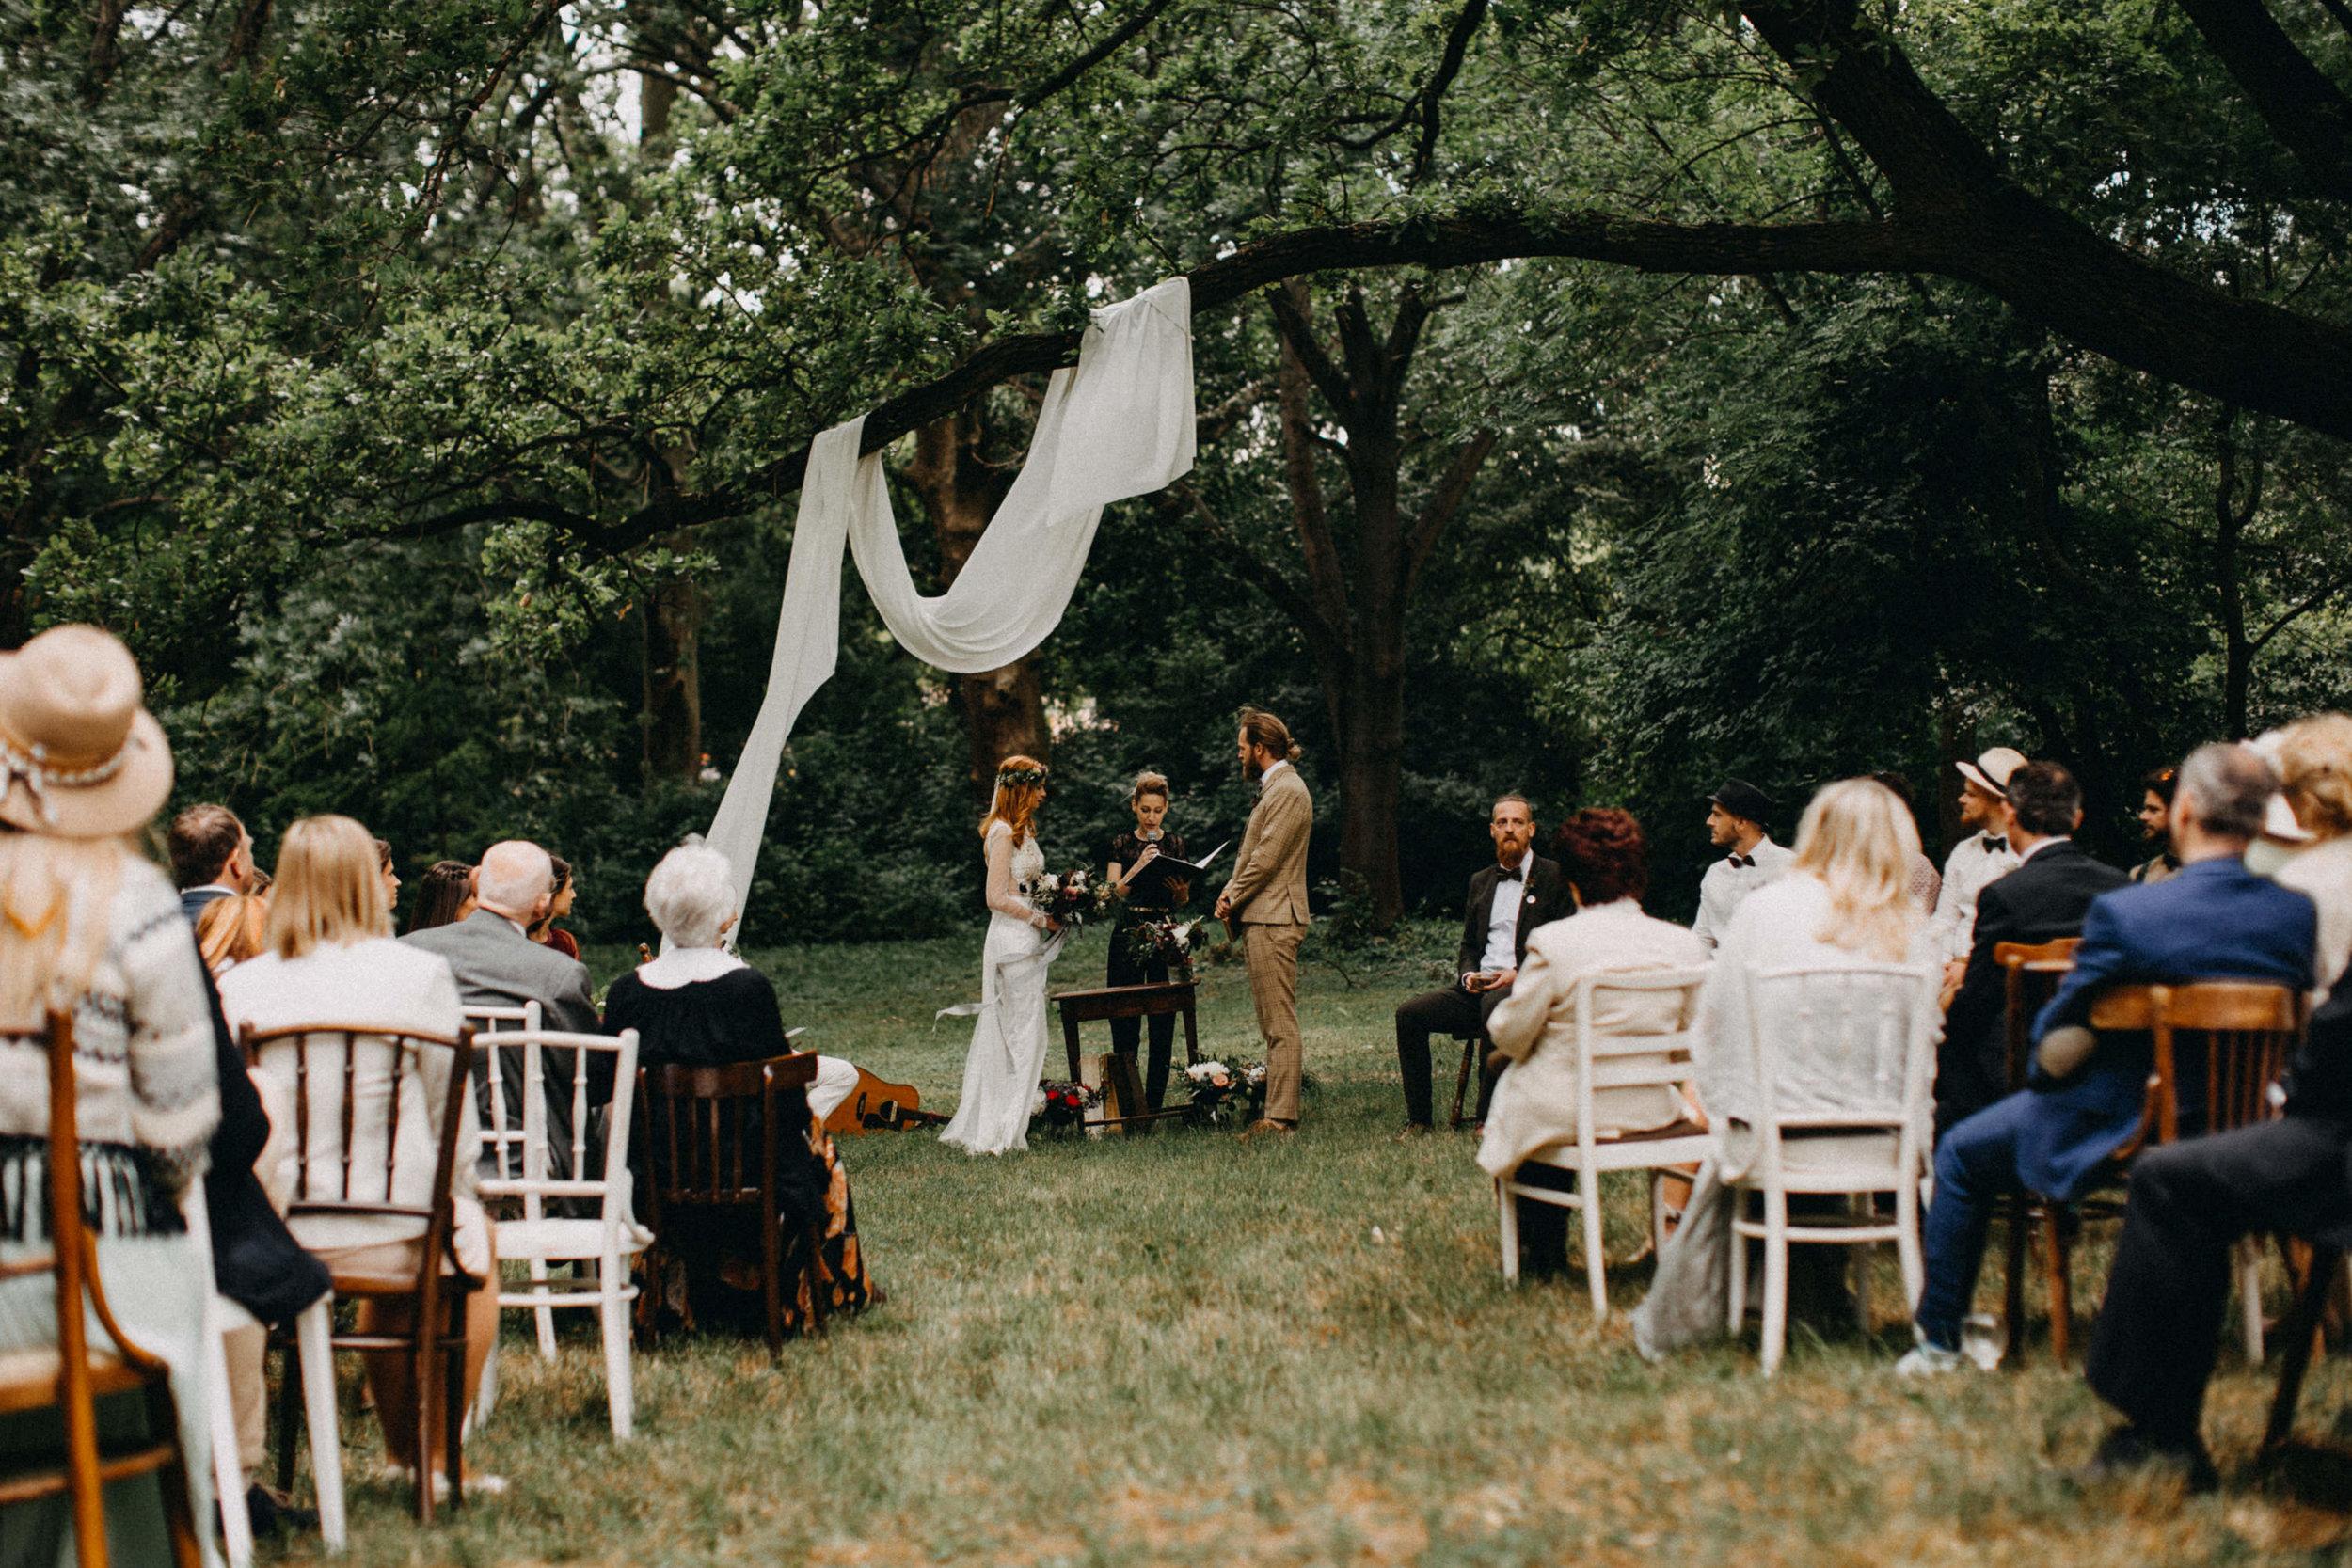 hungary-wedding-49.jpg